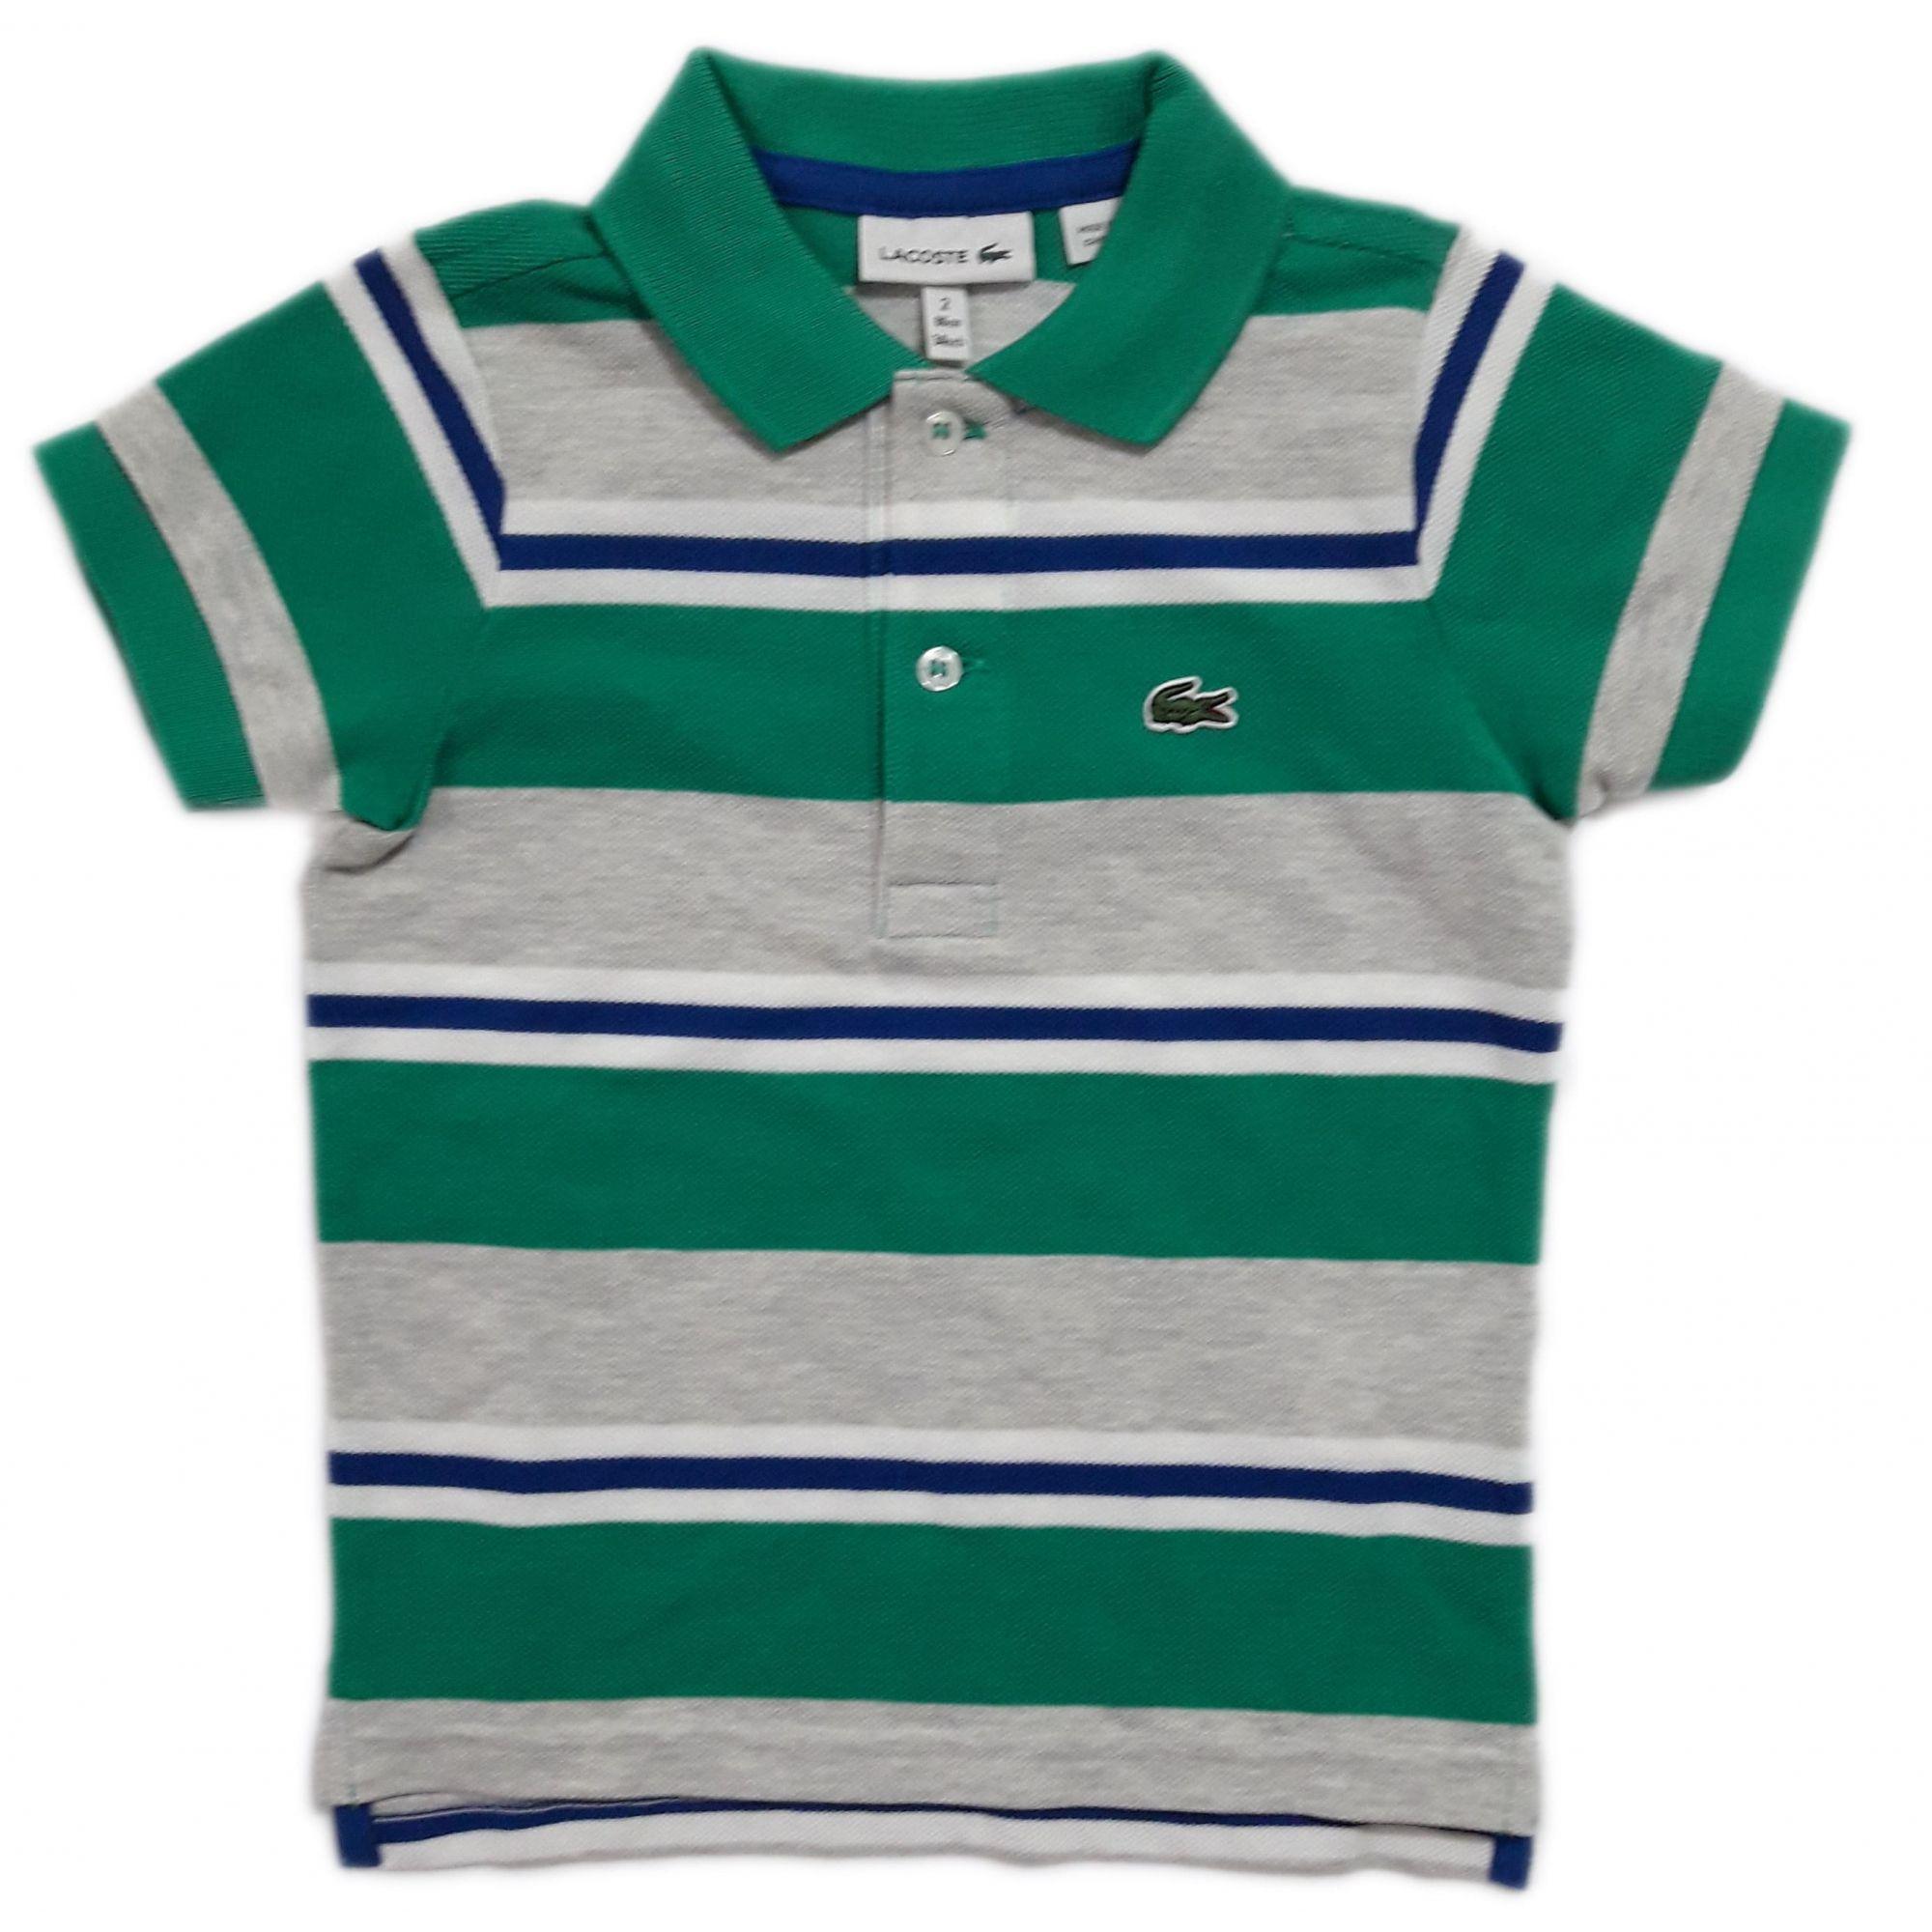 Camiseta PoloListrada Verde/Azul - Lacoste